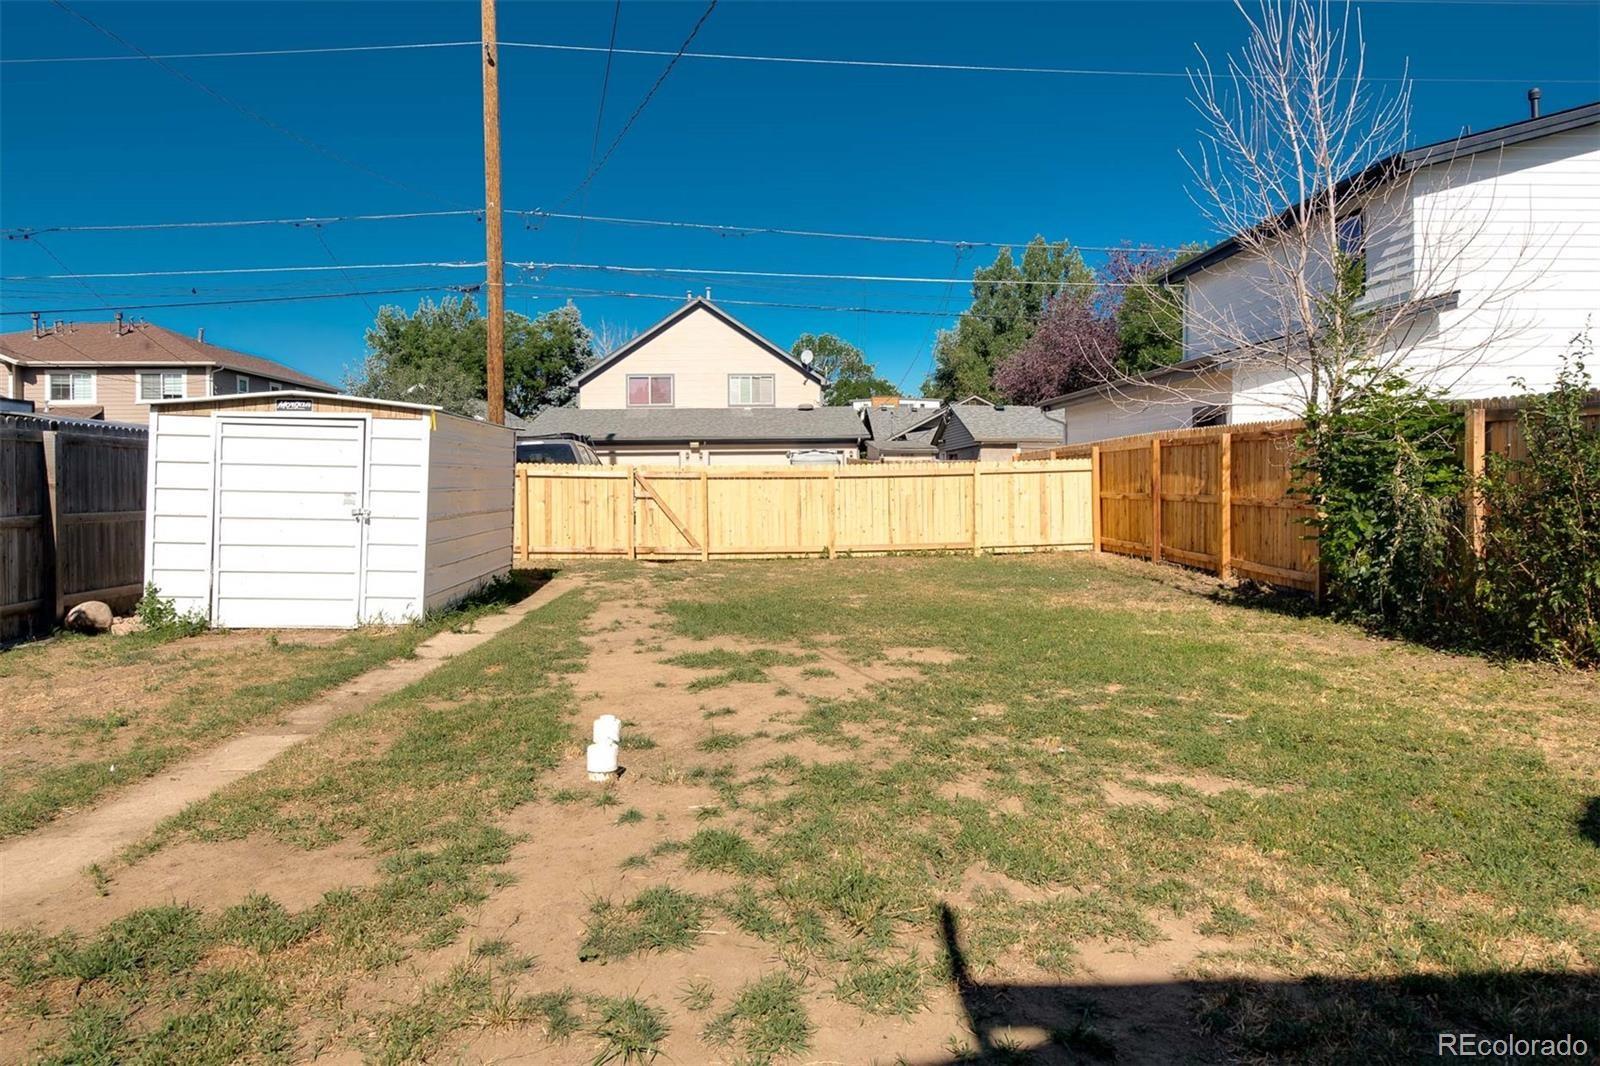 MLS# 2530145 - 17 - 4455 Xavier Street, Denver, CO 80212